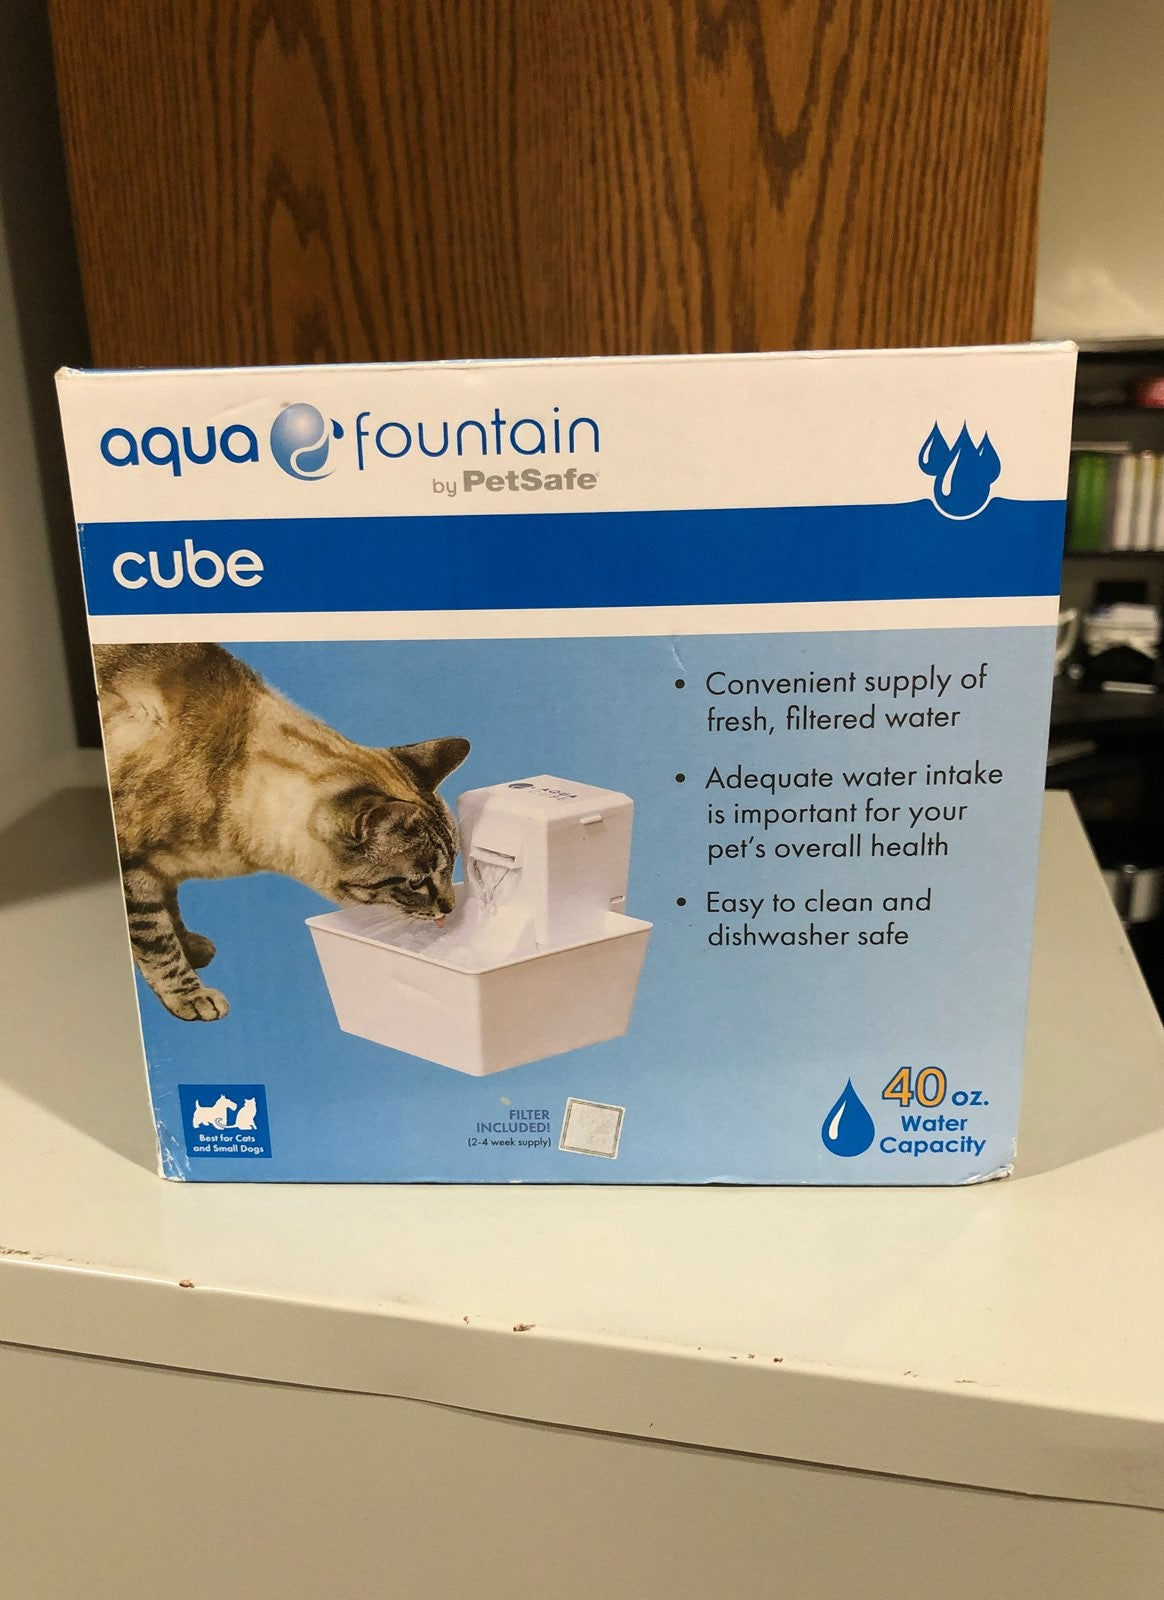 Agua Fountain Pet Safe Cube